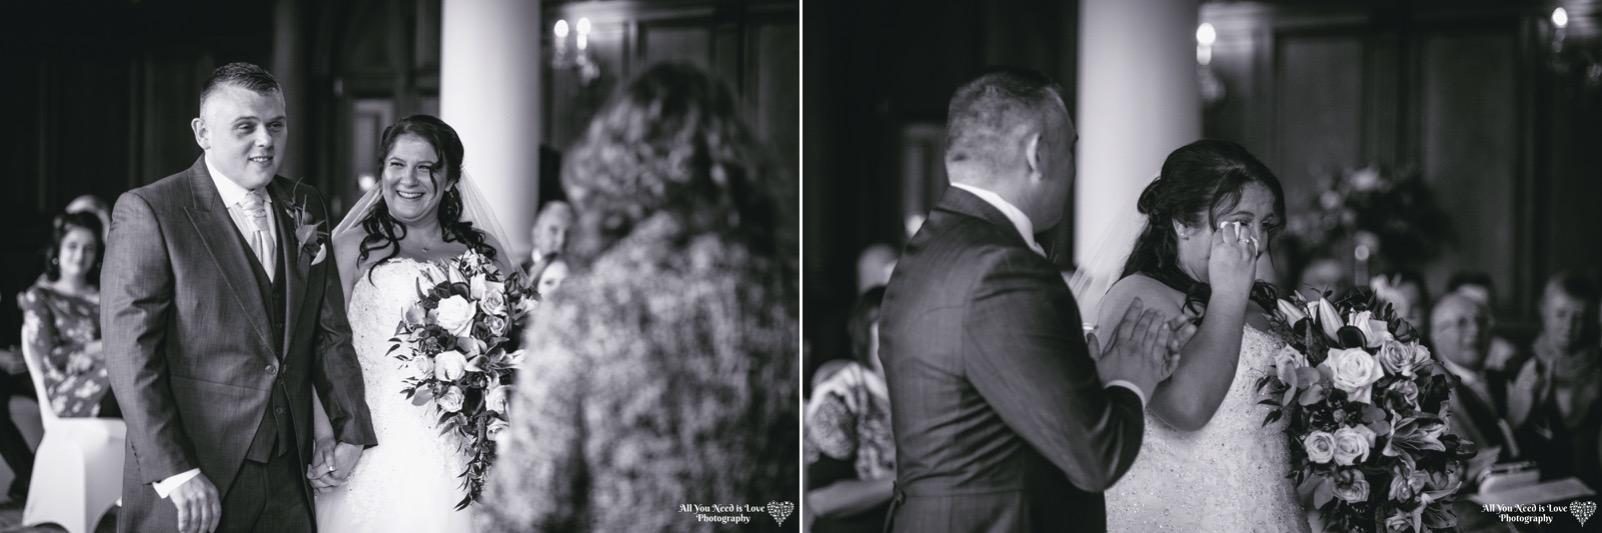 York civil ceremony photography